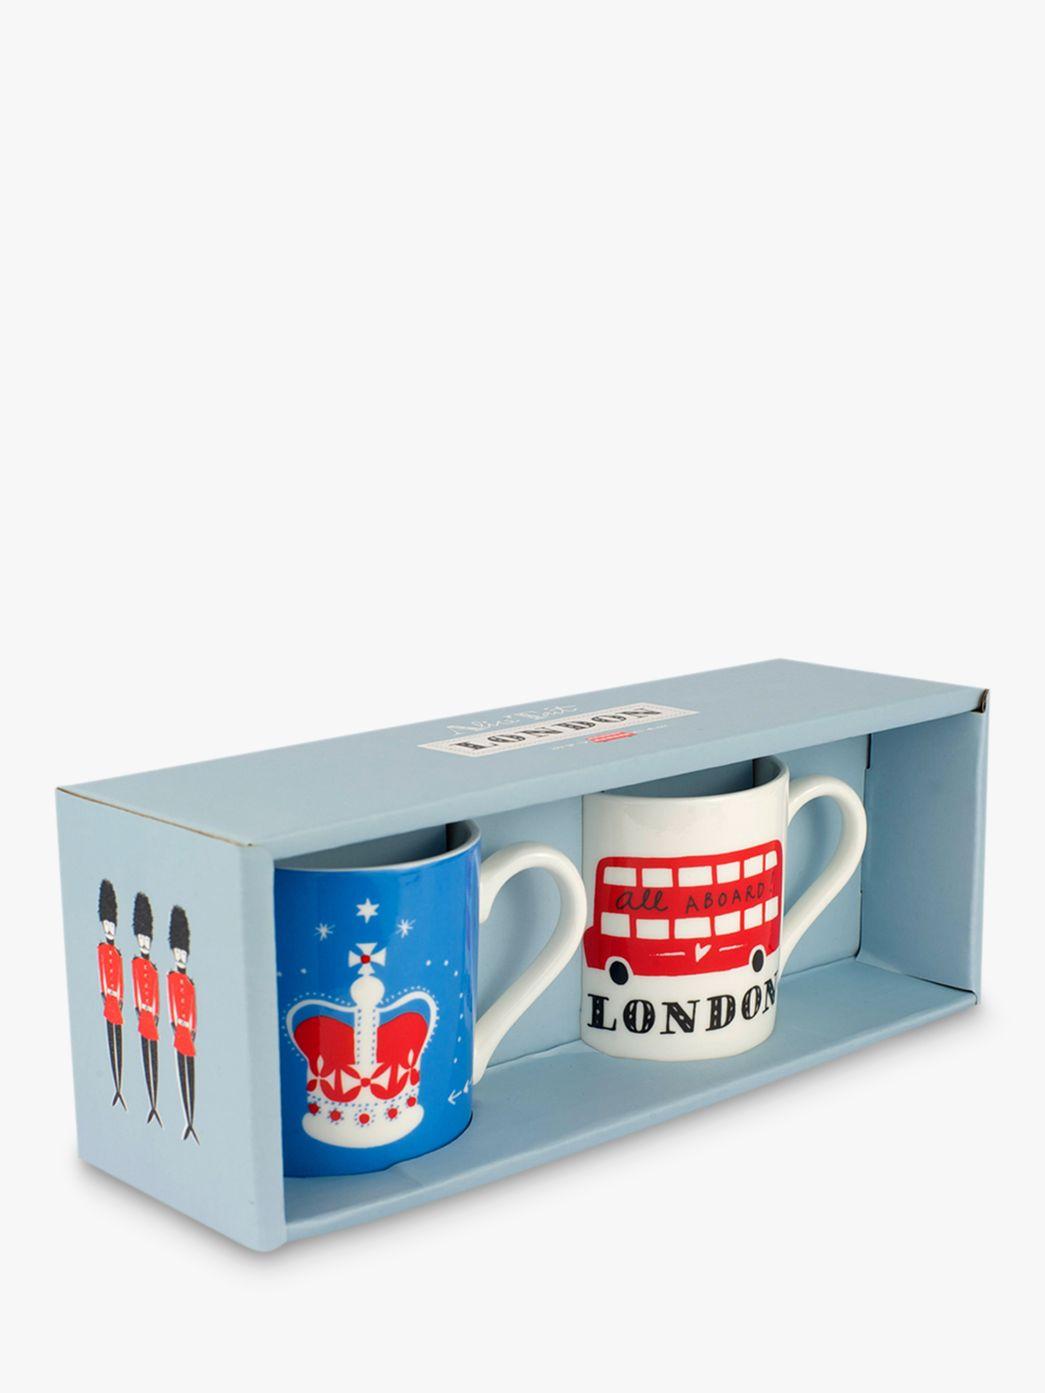 Alice Tait Alice Tait London Espresso Set